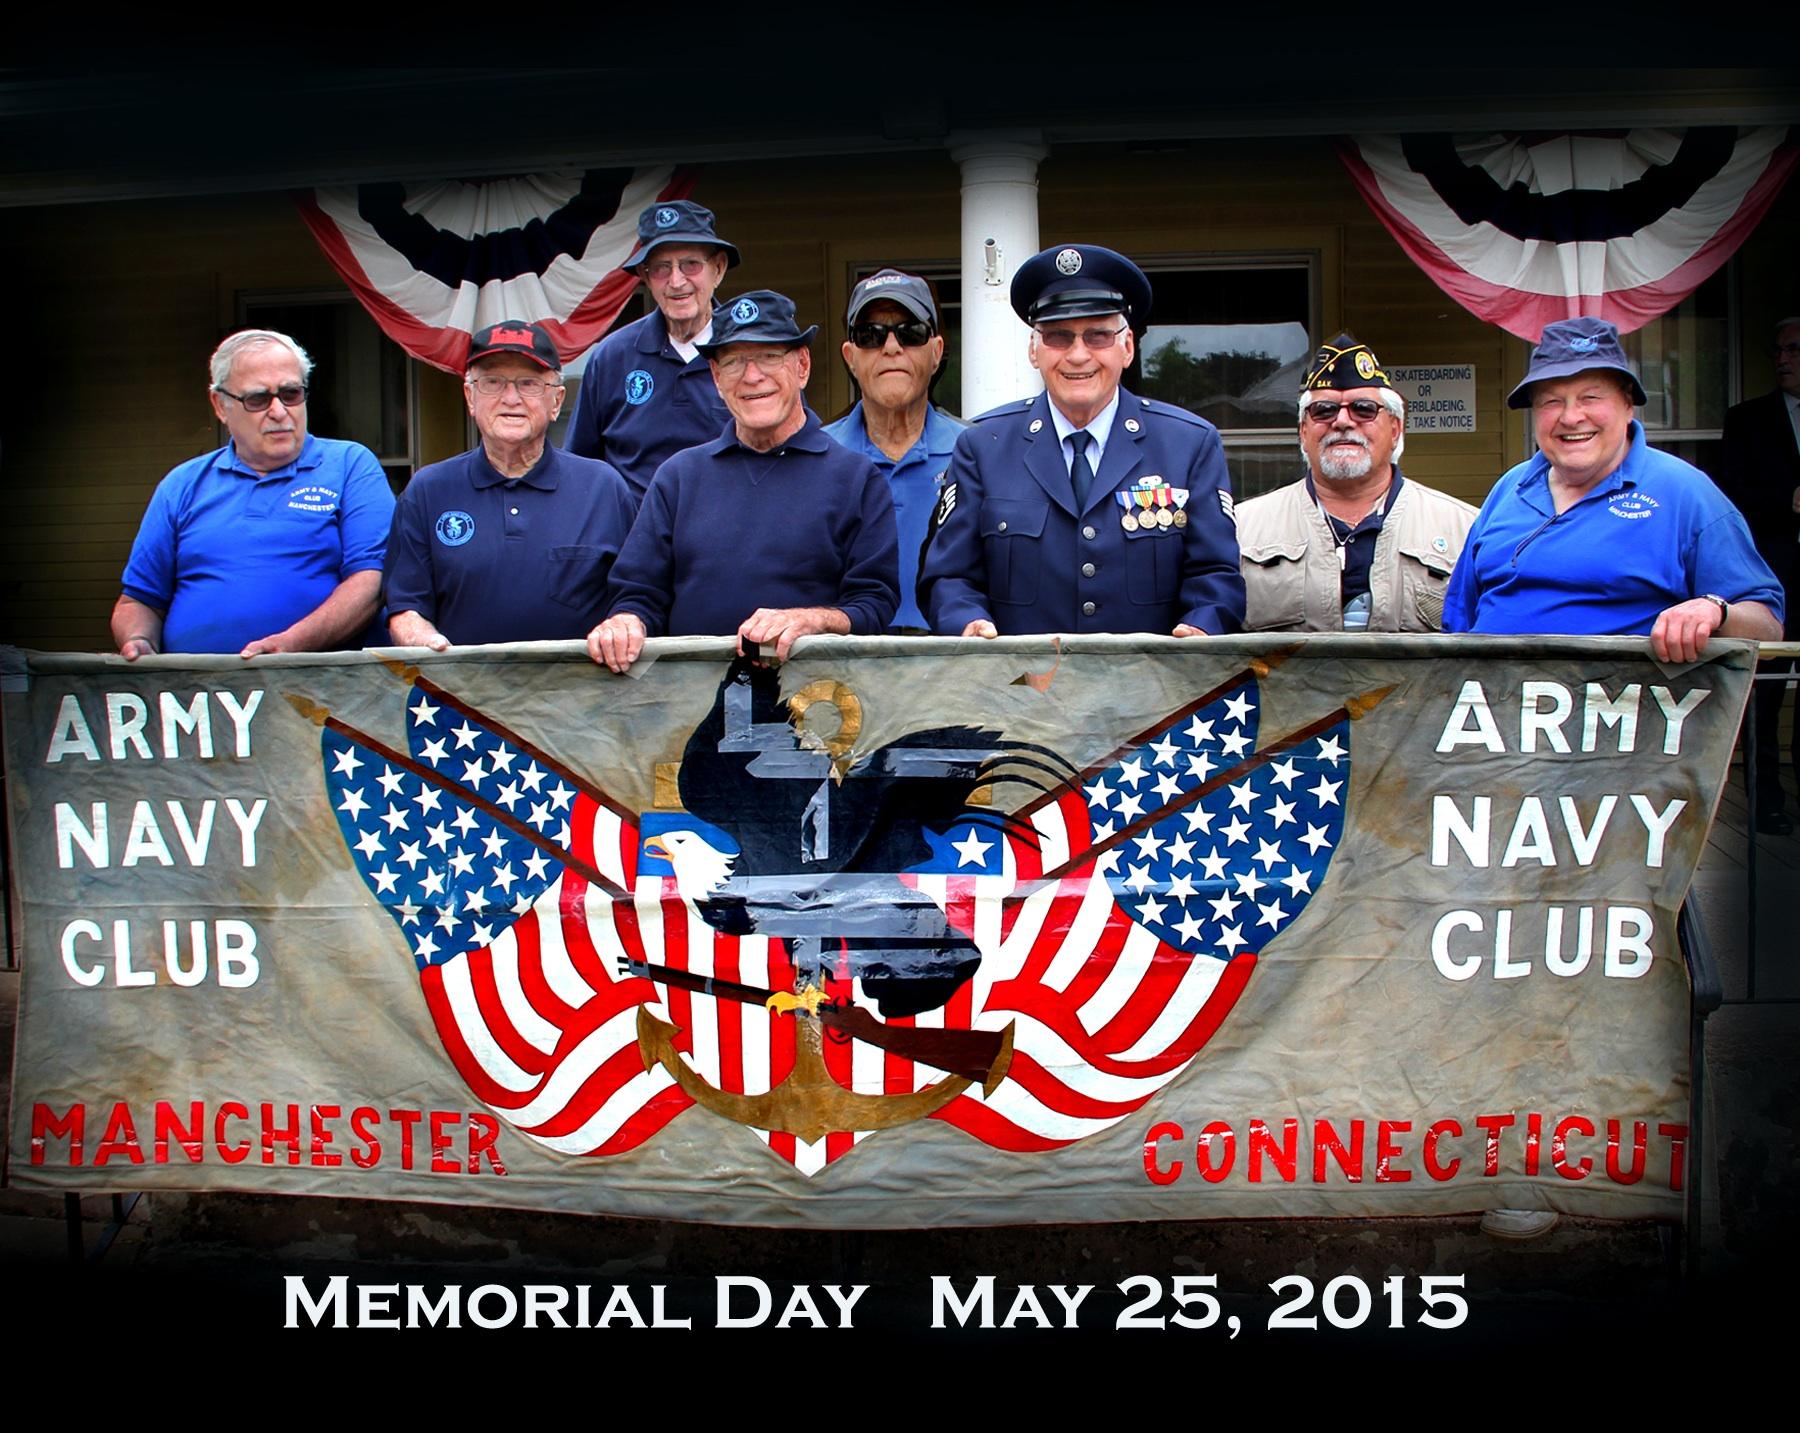 ArmyNavy Memorial Day 2015